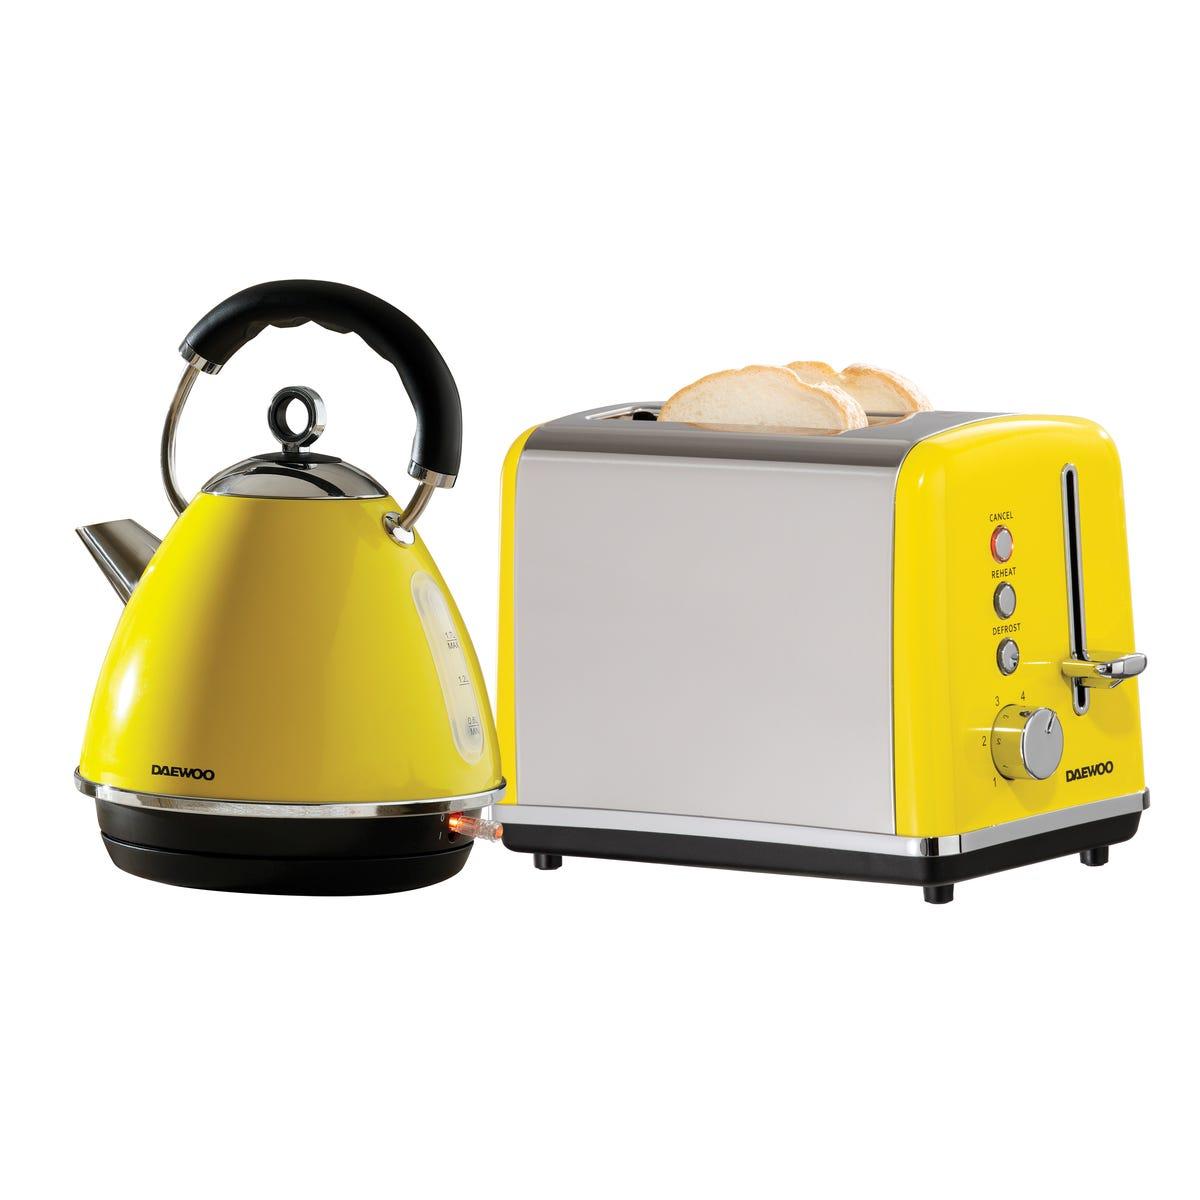 Daewoo SDA2372DS Soho 1.7L 3KW Pyramid Kettle and 2 Slice Toaster Set - Yellow